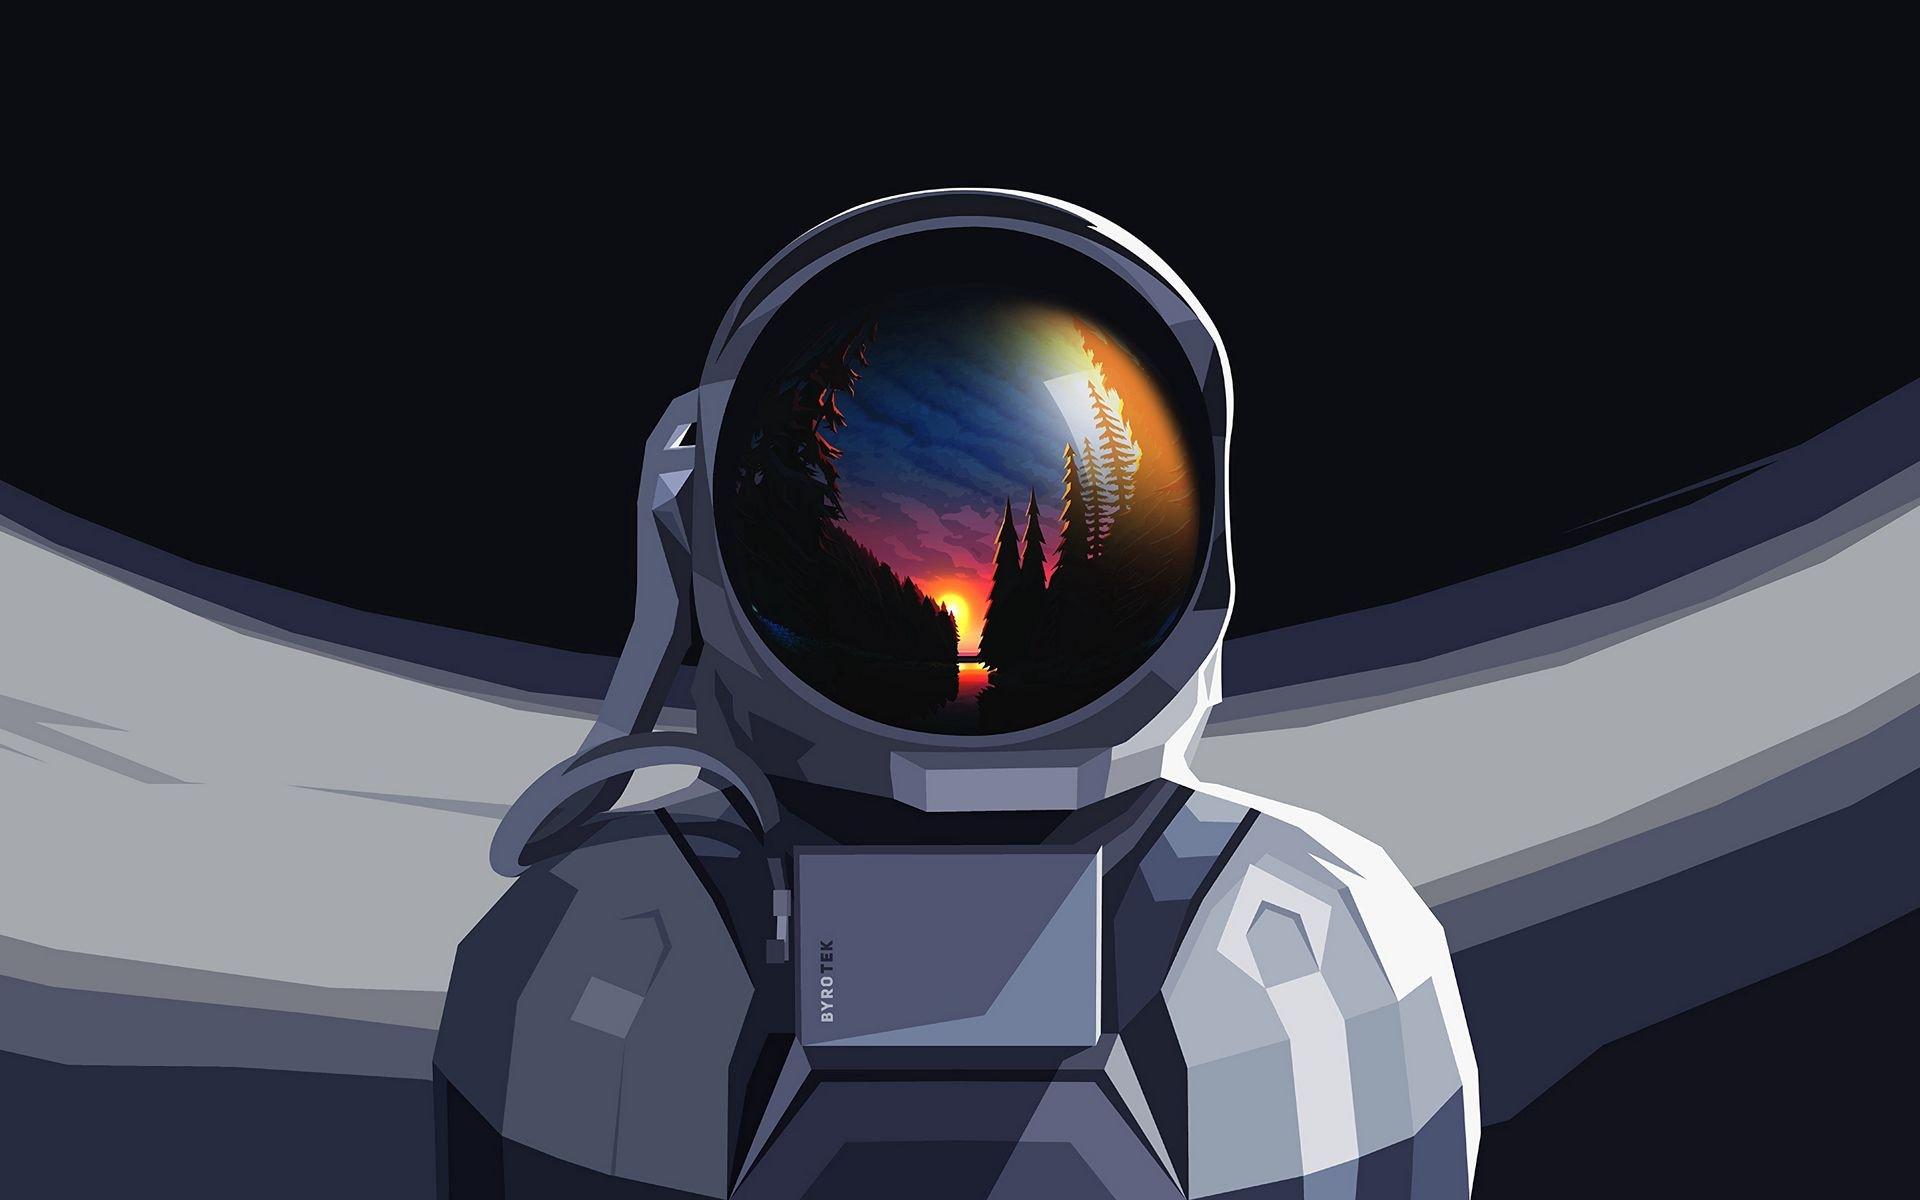 Fondos de pantalla Astronauta con paisaje reflejado en casco